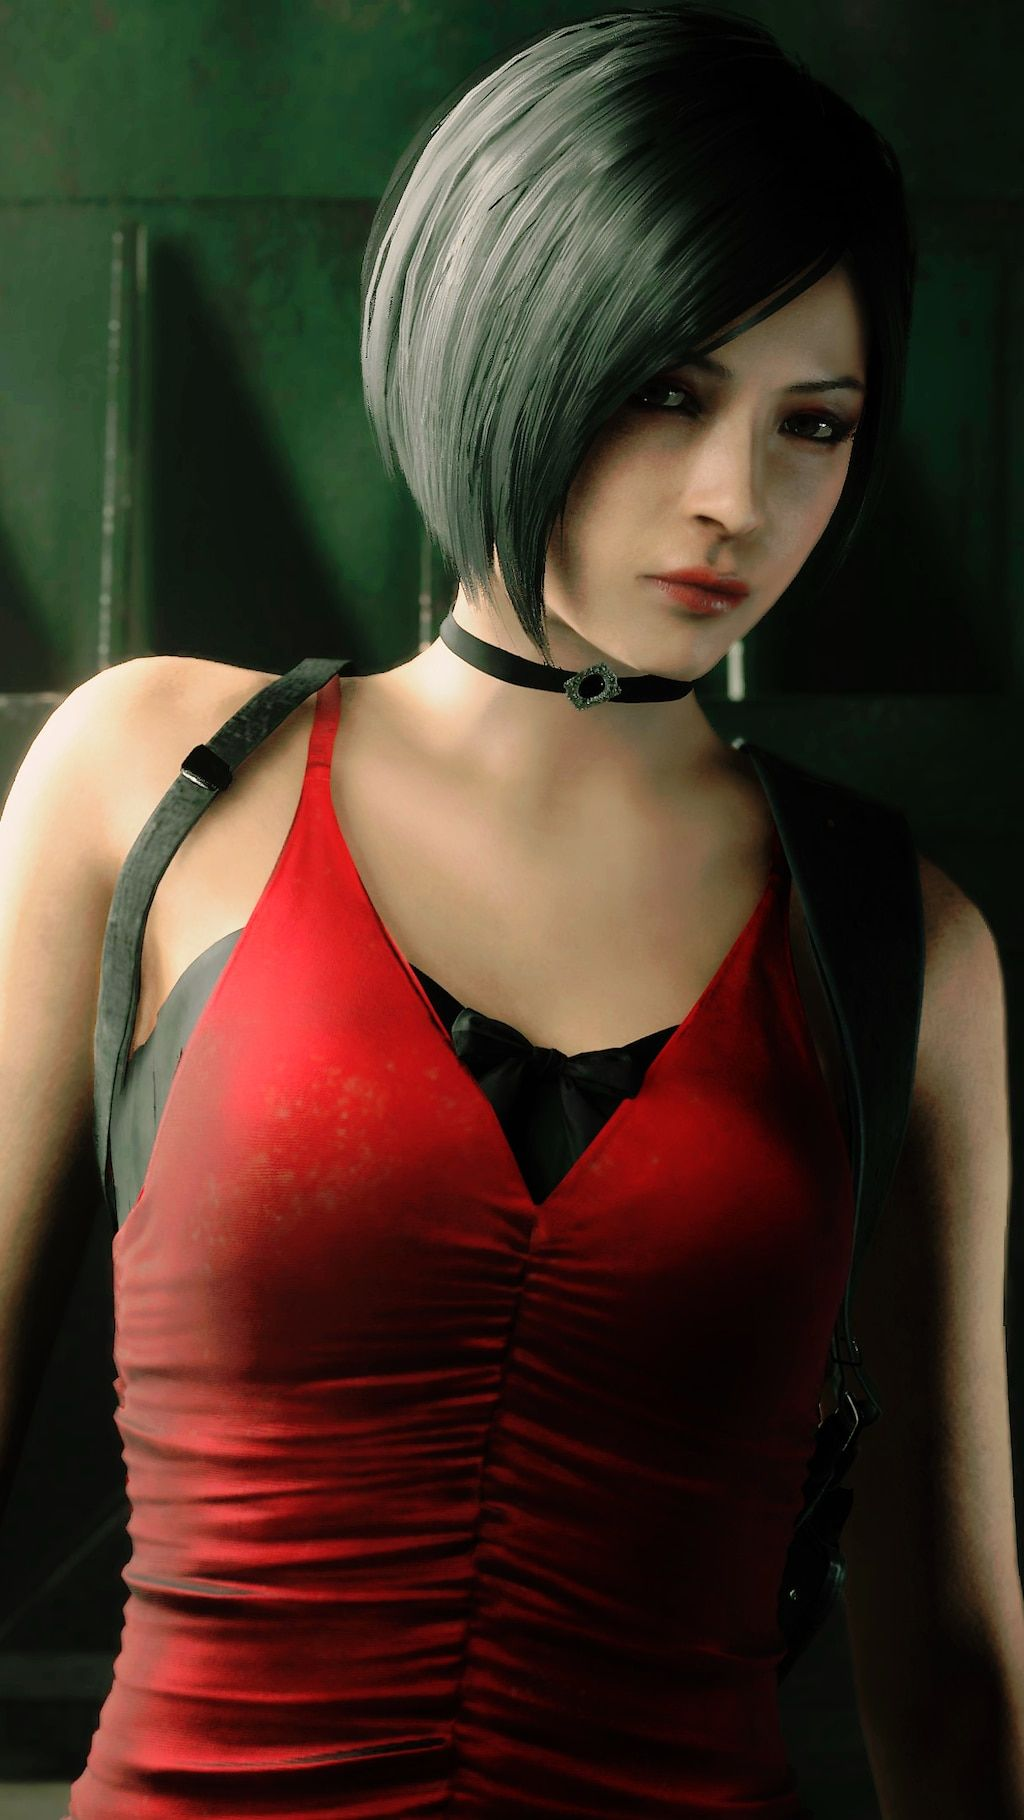 Steam Community Resident Evil 2 Biohazard Re 2 Con Imagenes